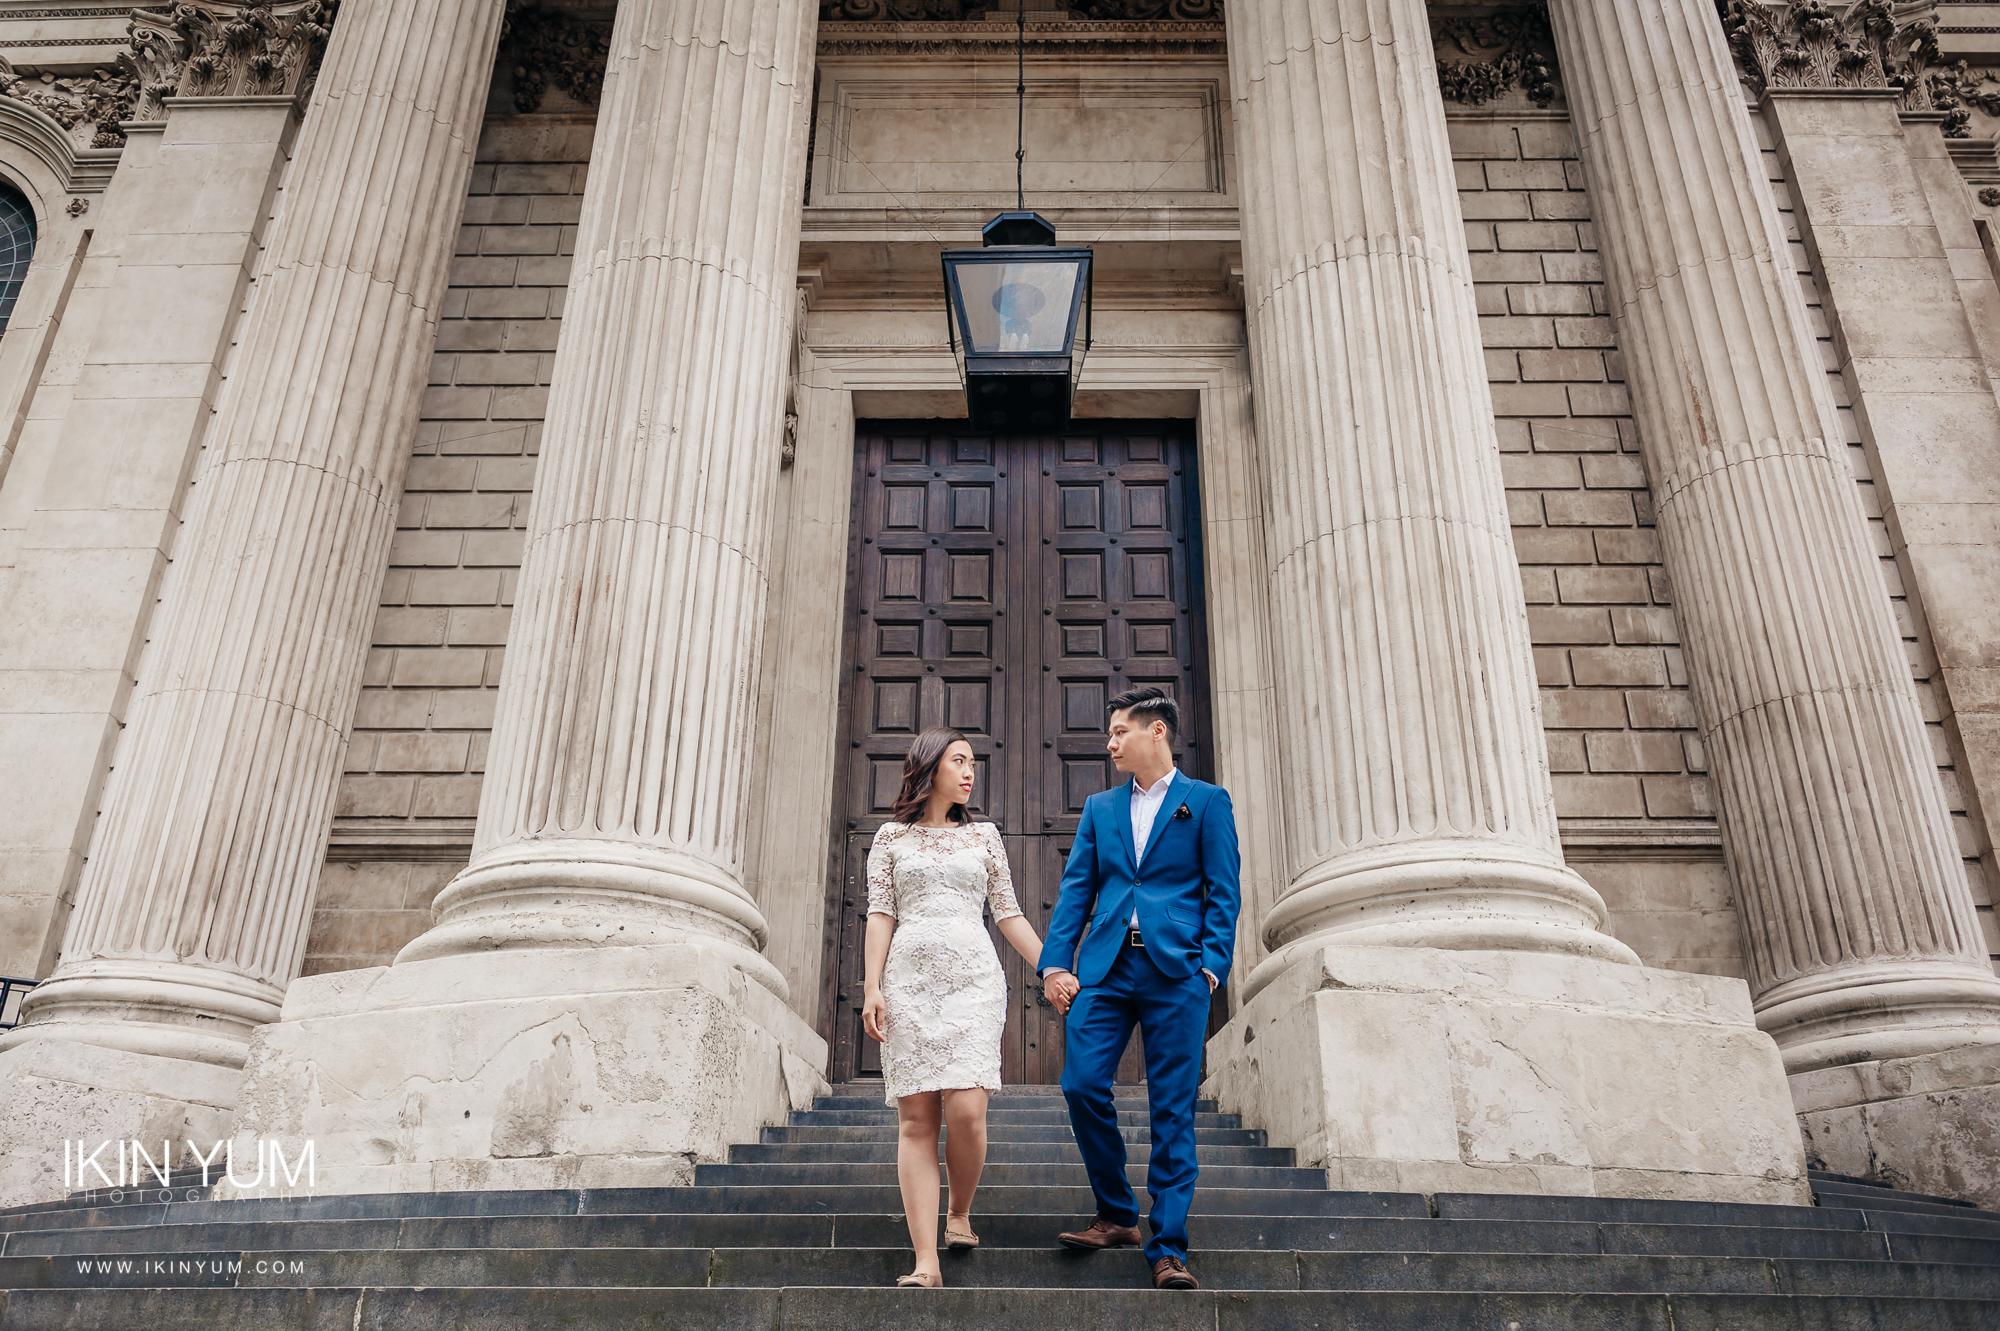 Natalie & Duncan Wedding Day - Ikin Yum Photography-130.jpg